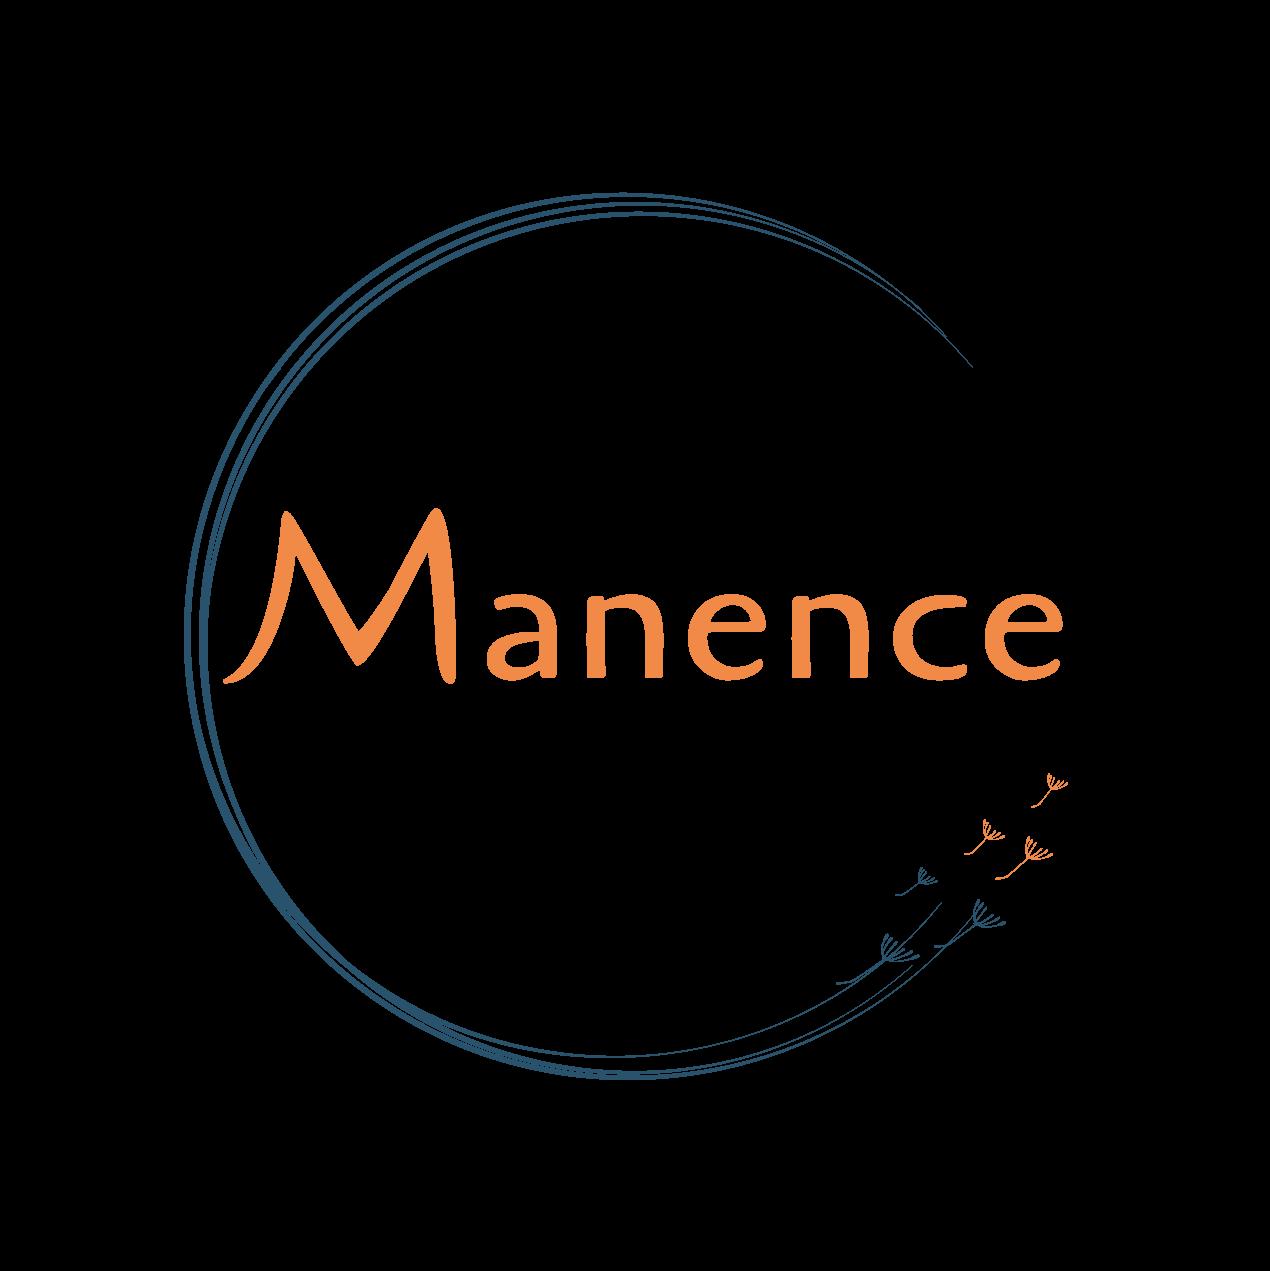 Manence